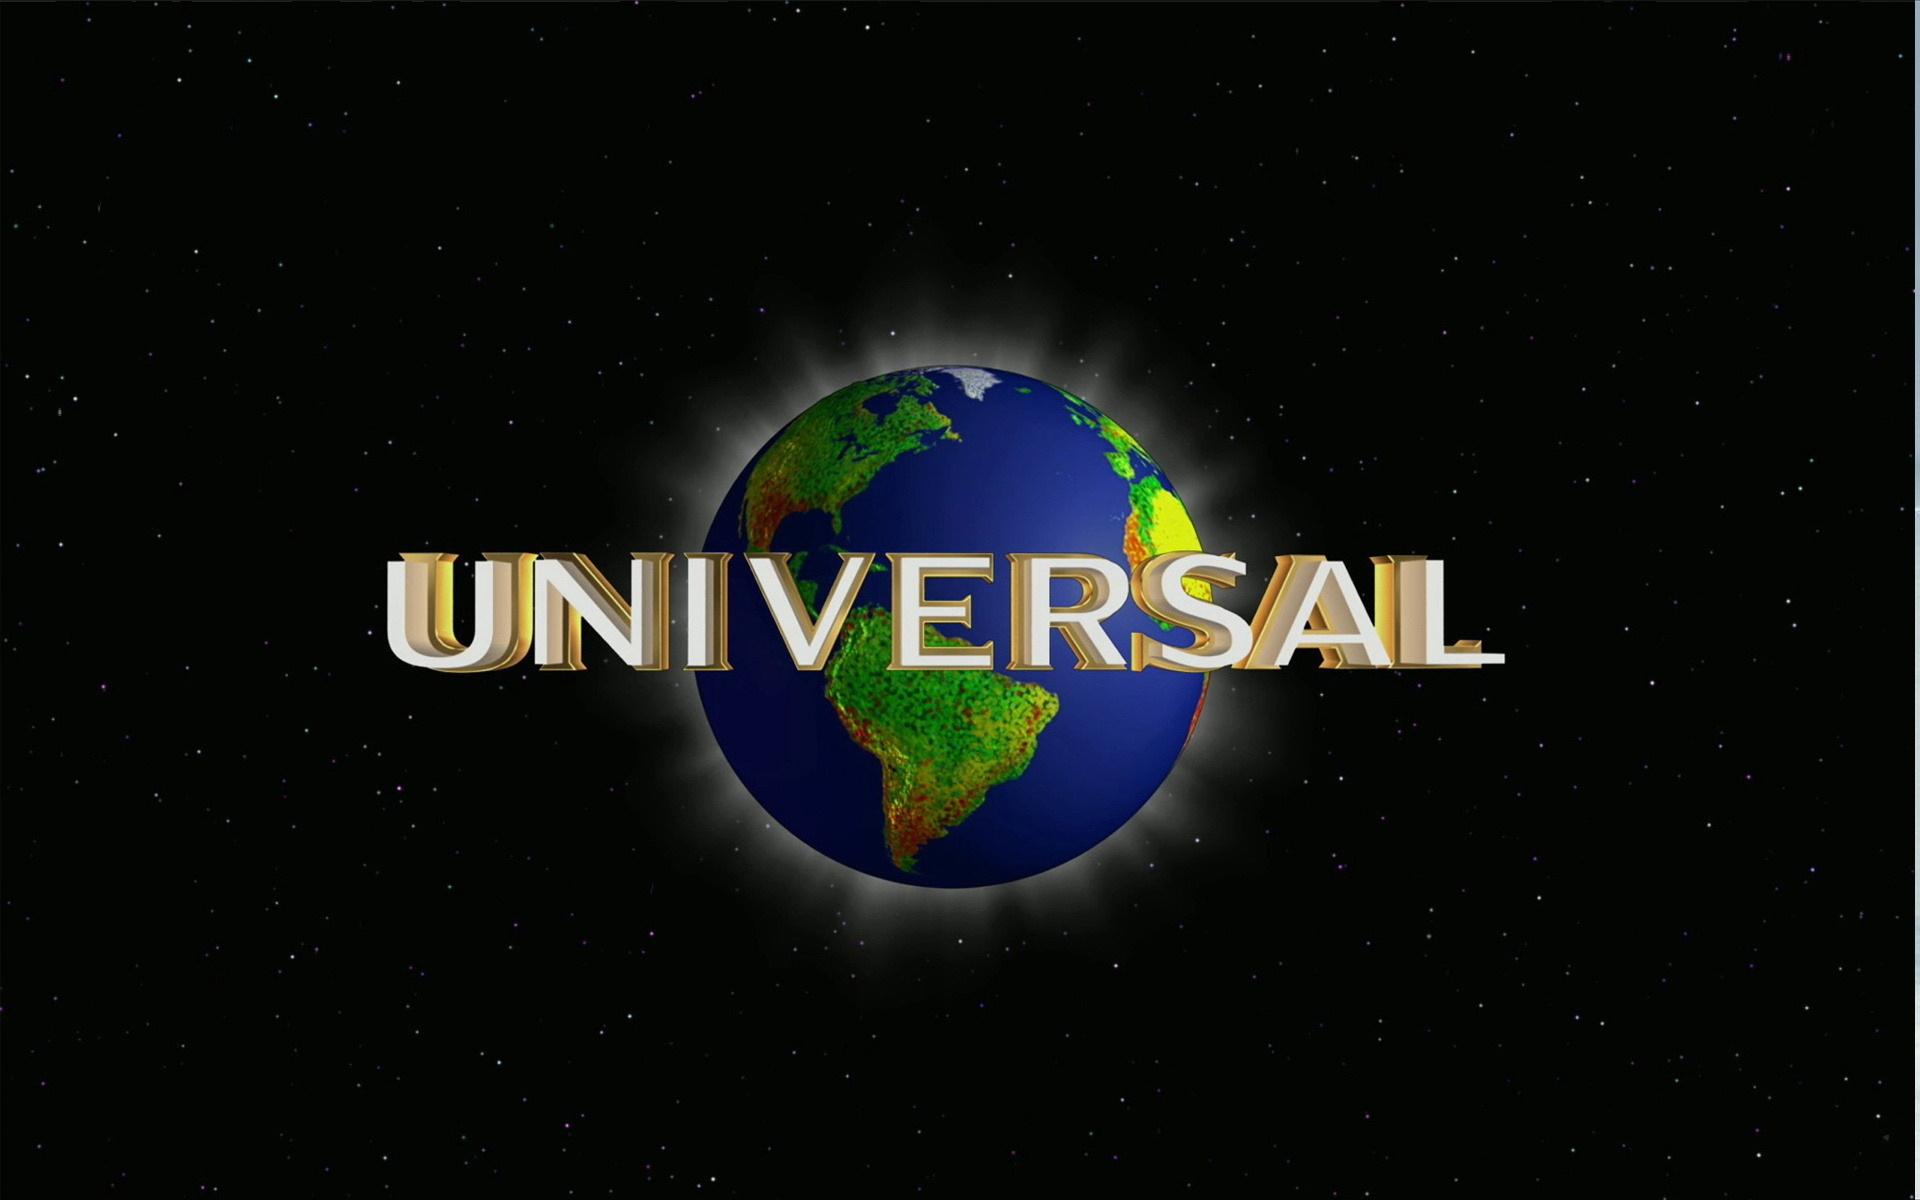 Universal salary